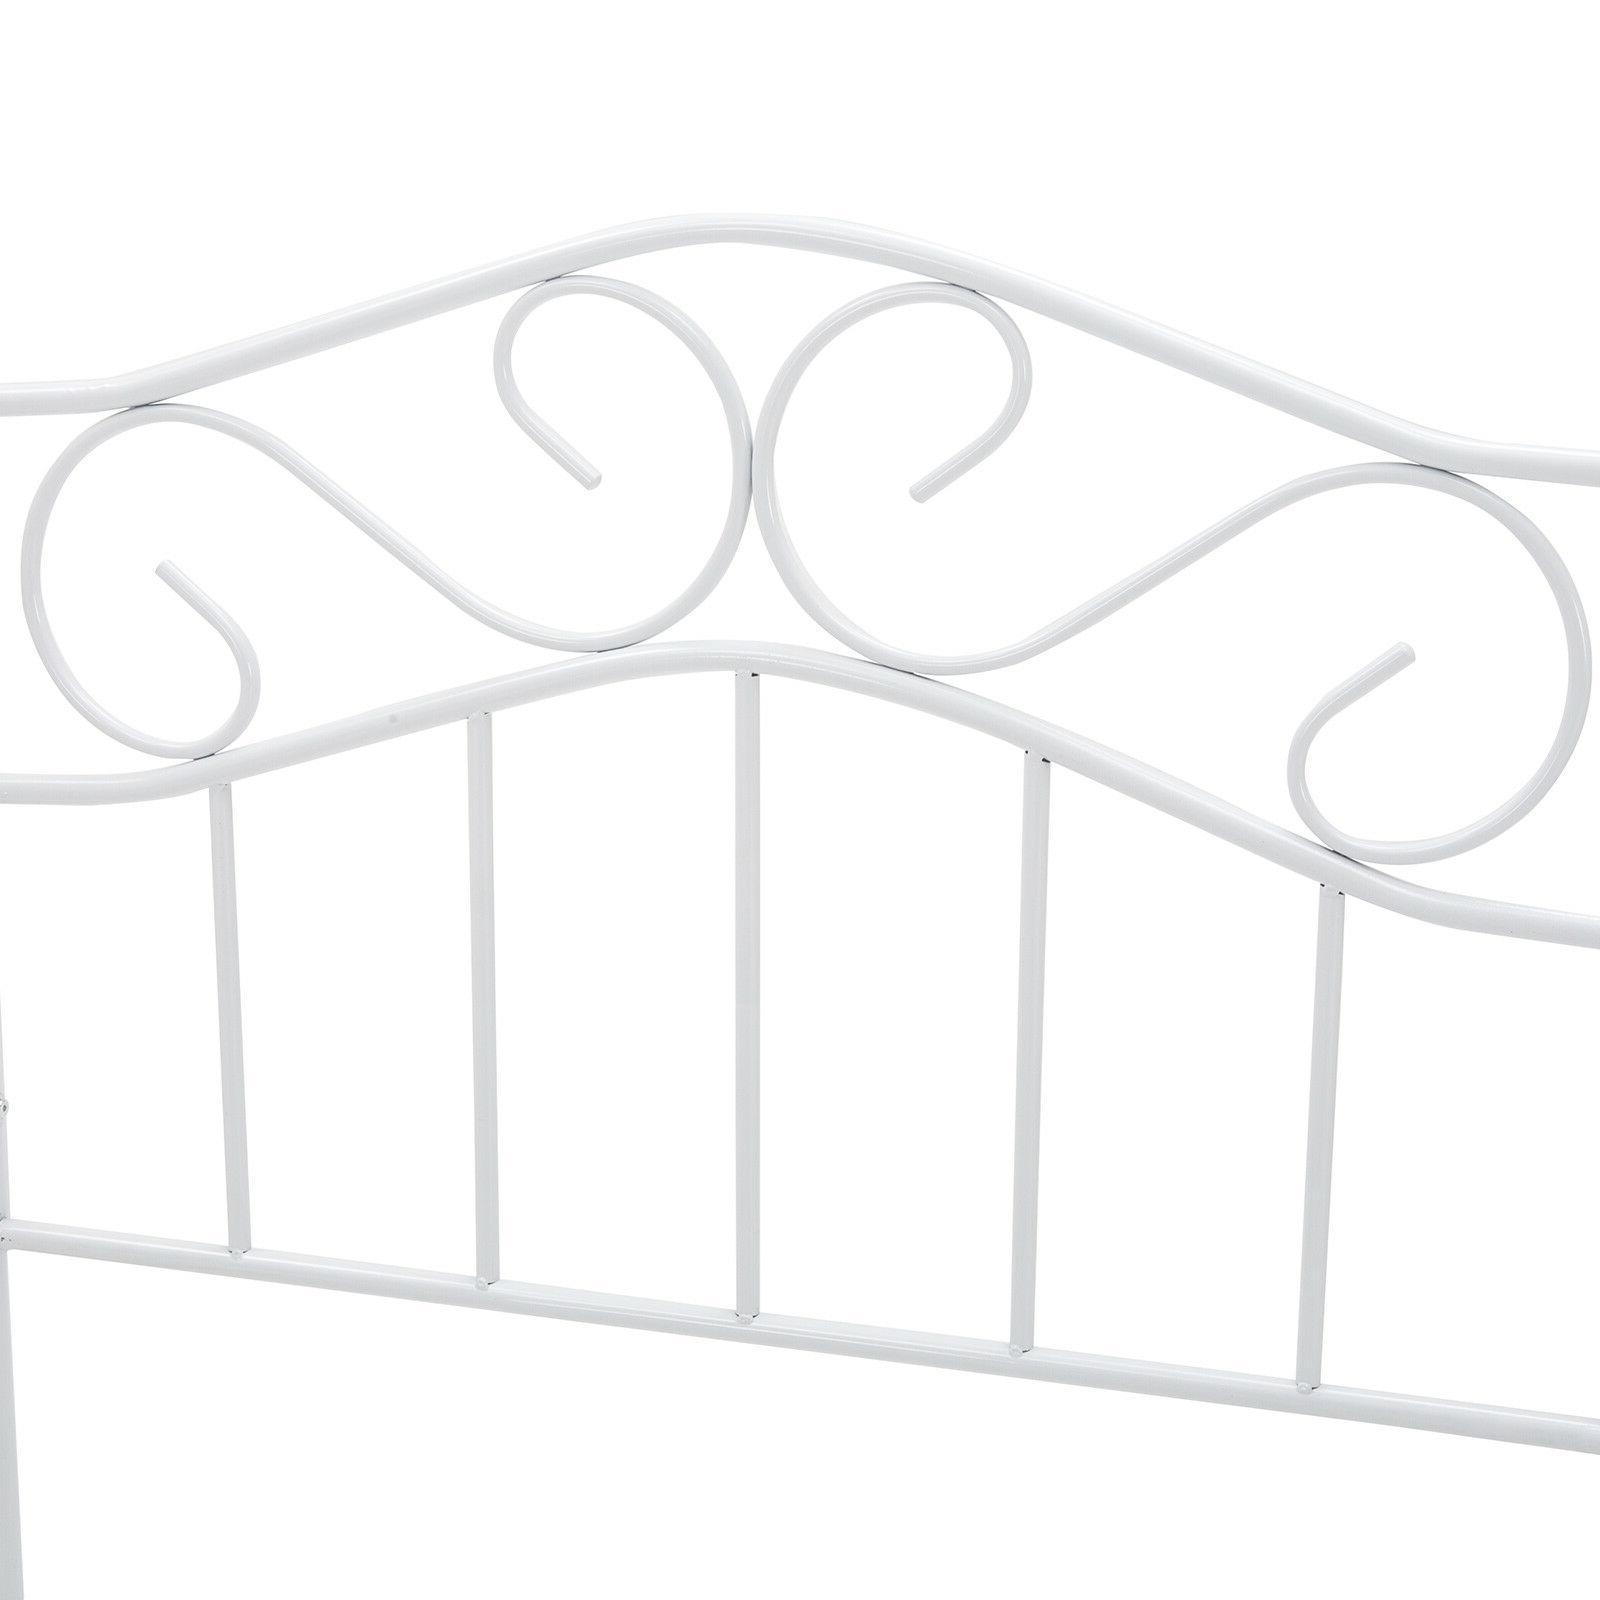 Twin Heavy Metal Bed Headboard Footboard